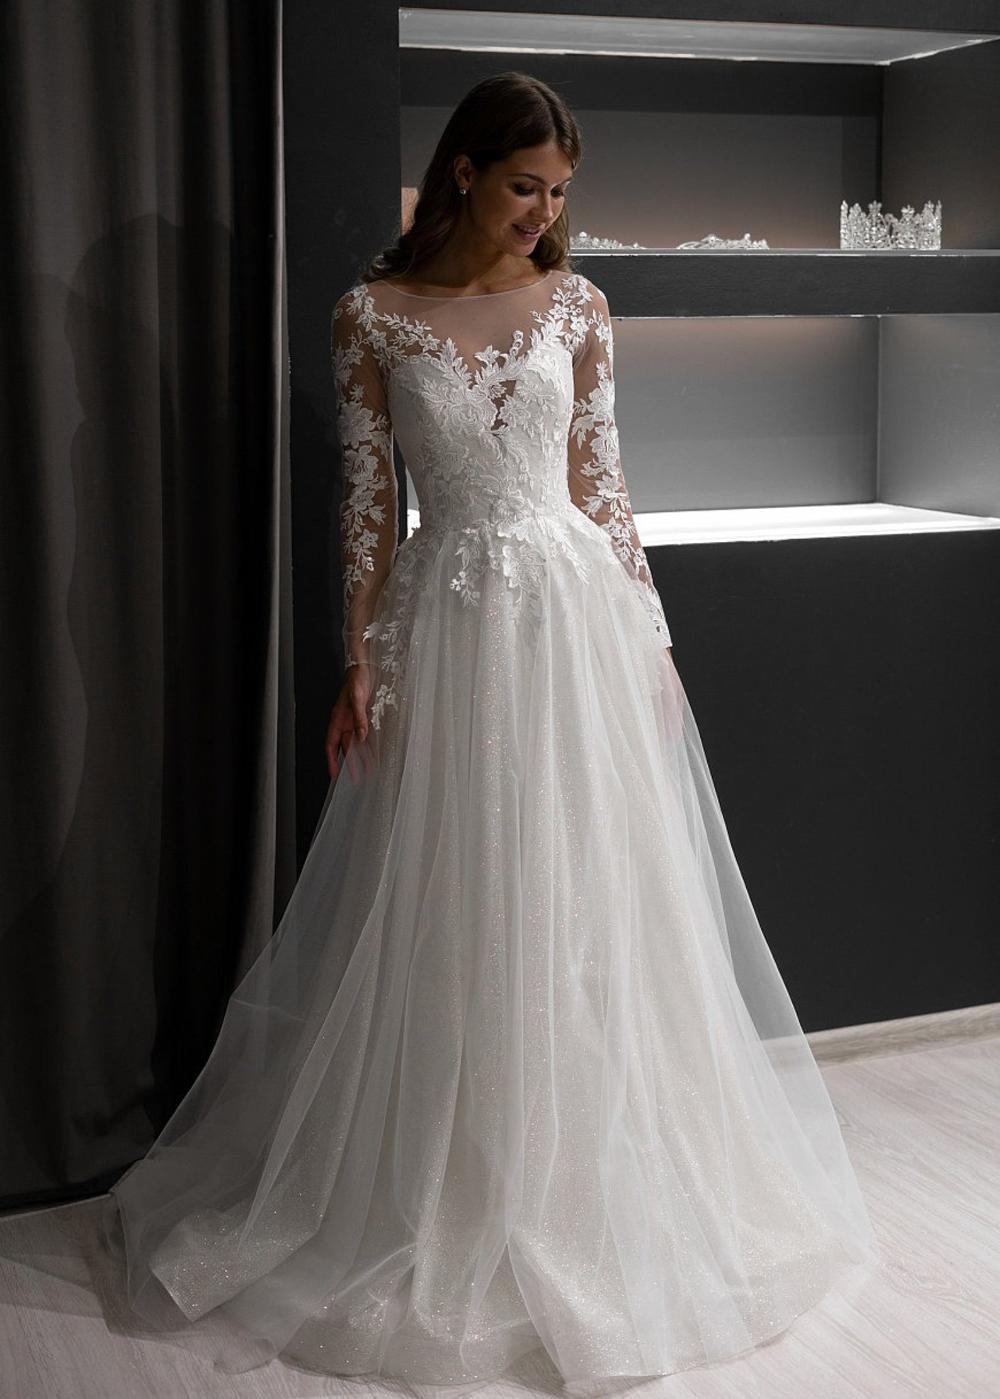 Ivanel By Olivia Bottega Open Back Sequined Wedding Gown Wedding Dress Open Back Dress Floral Lace Dress In 2021 Online Wedding Dress Wedding Dresses Wedding Dress Long Sleeve [ 1399 x 1000 Pixel ]